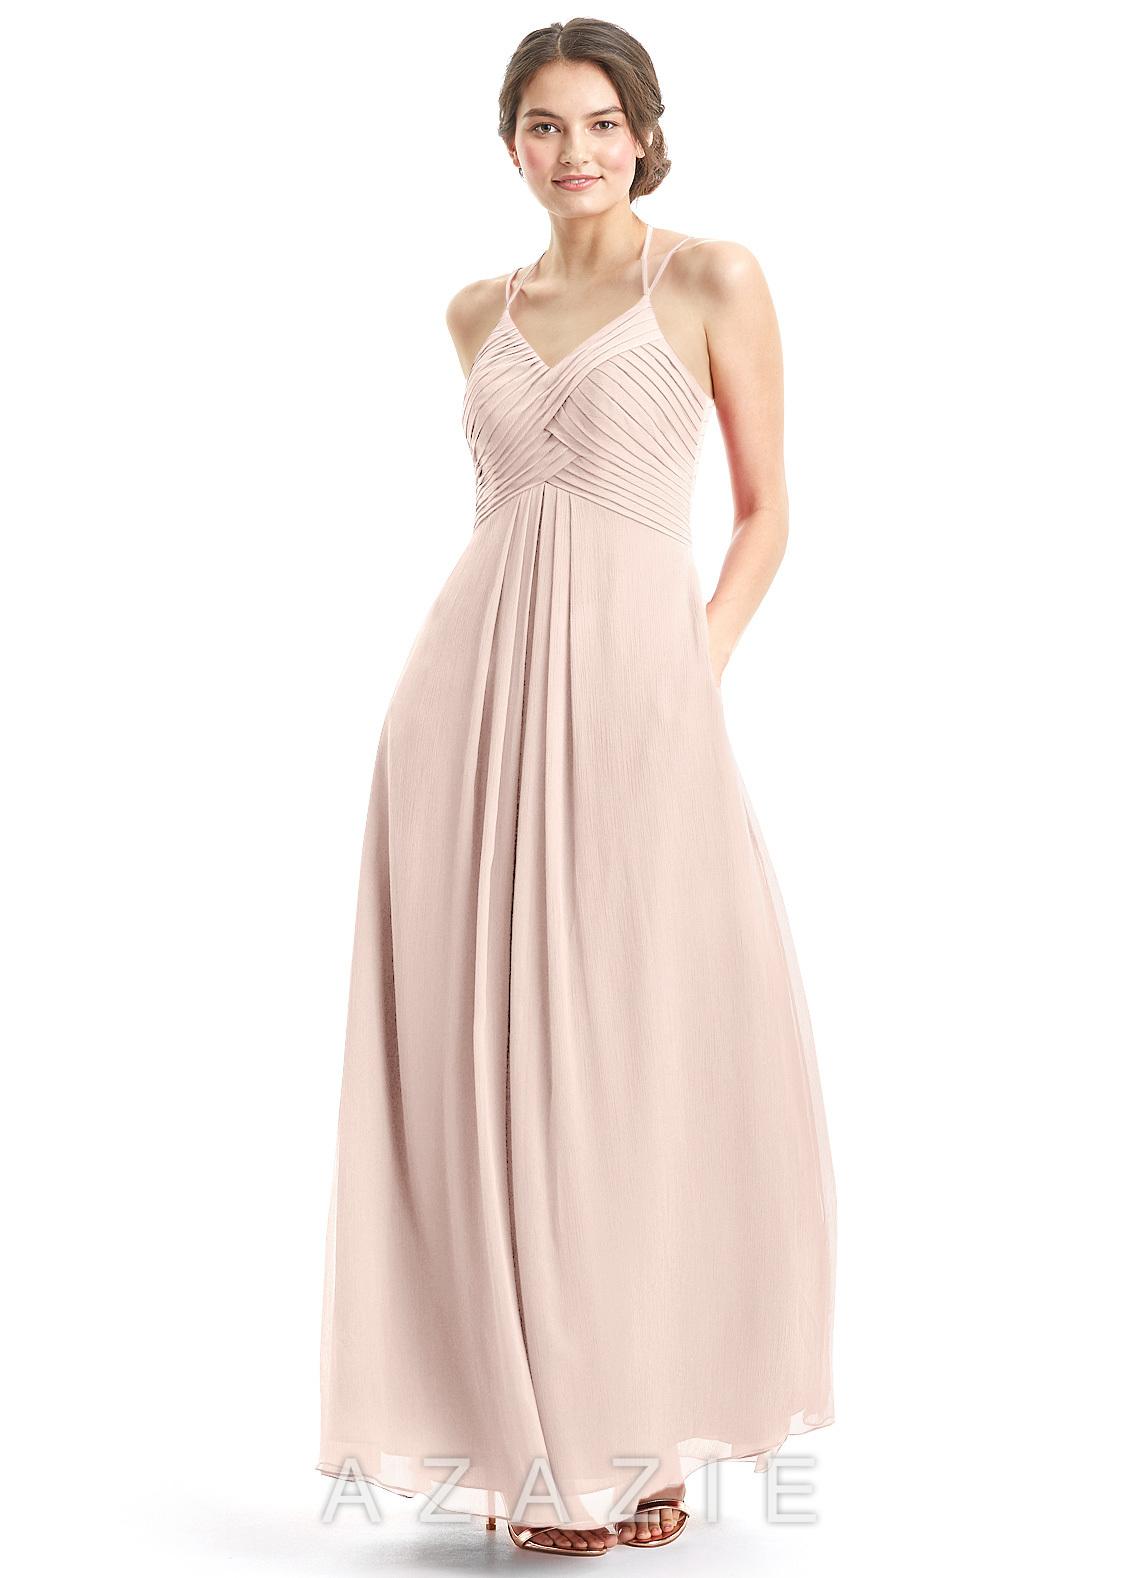 Home Bridesmaid Dresses Azazie Eden Loading Zoom